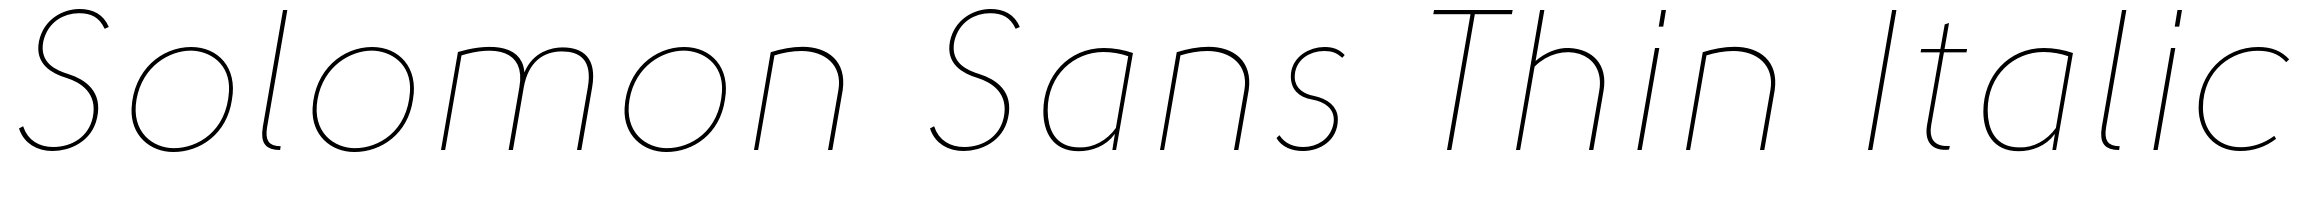 Solomon Sans Thin Italic